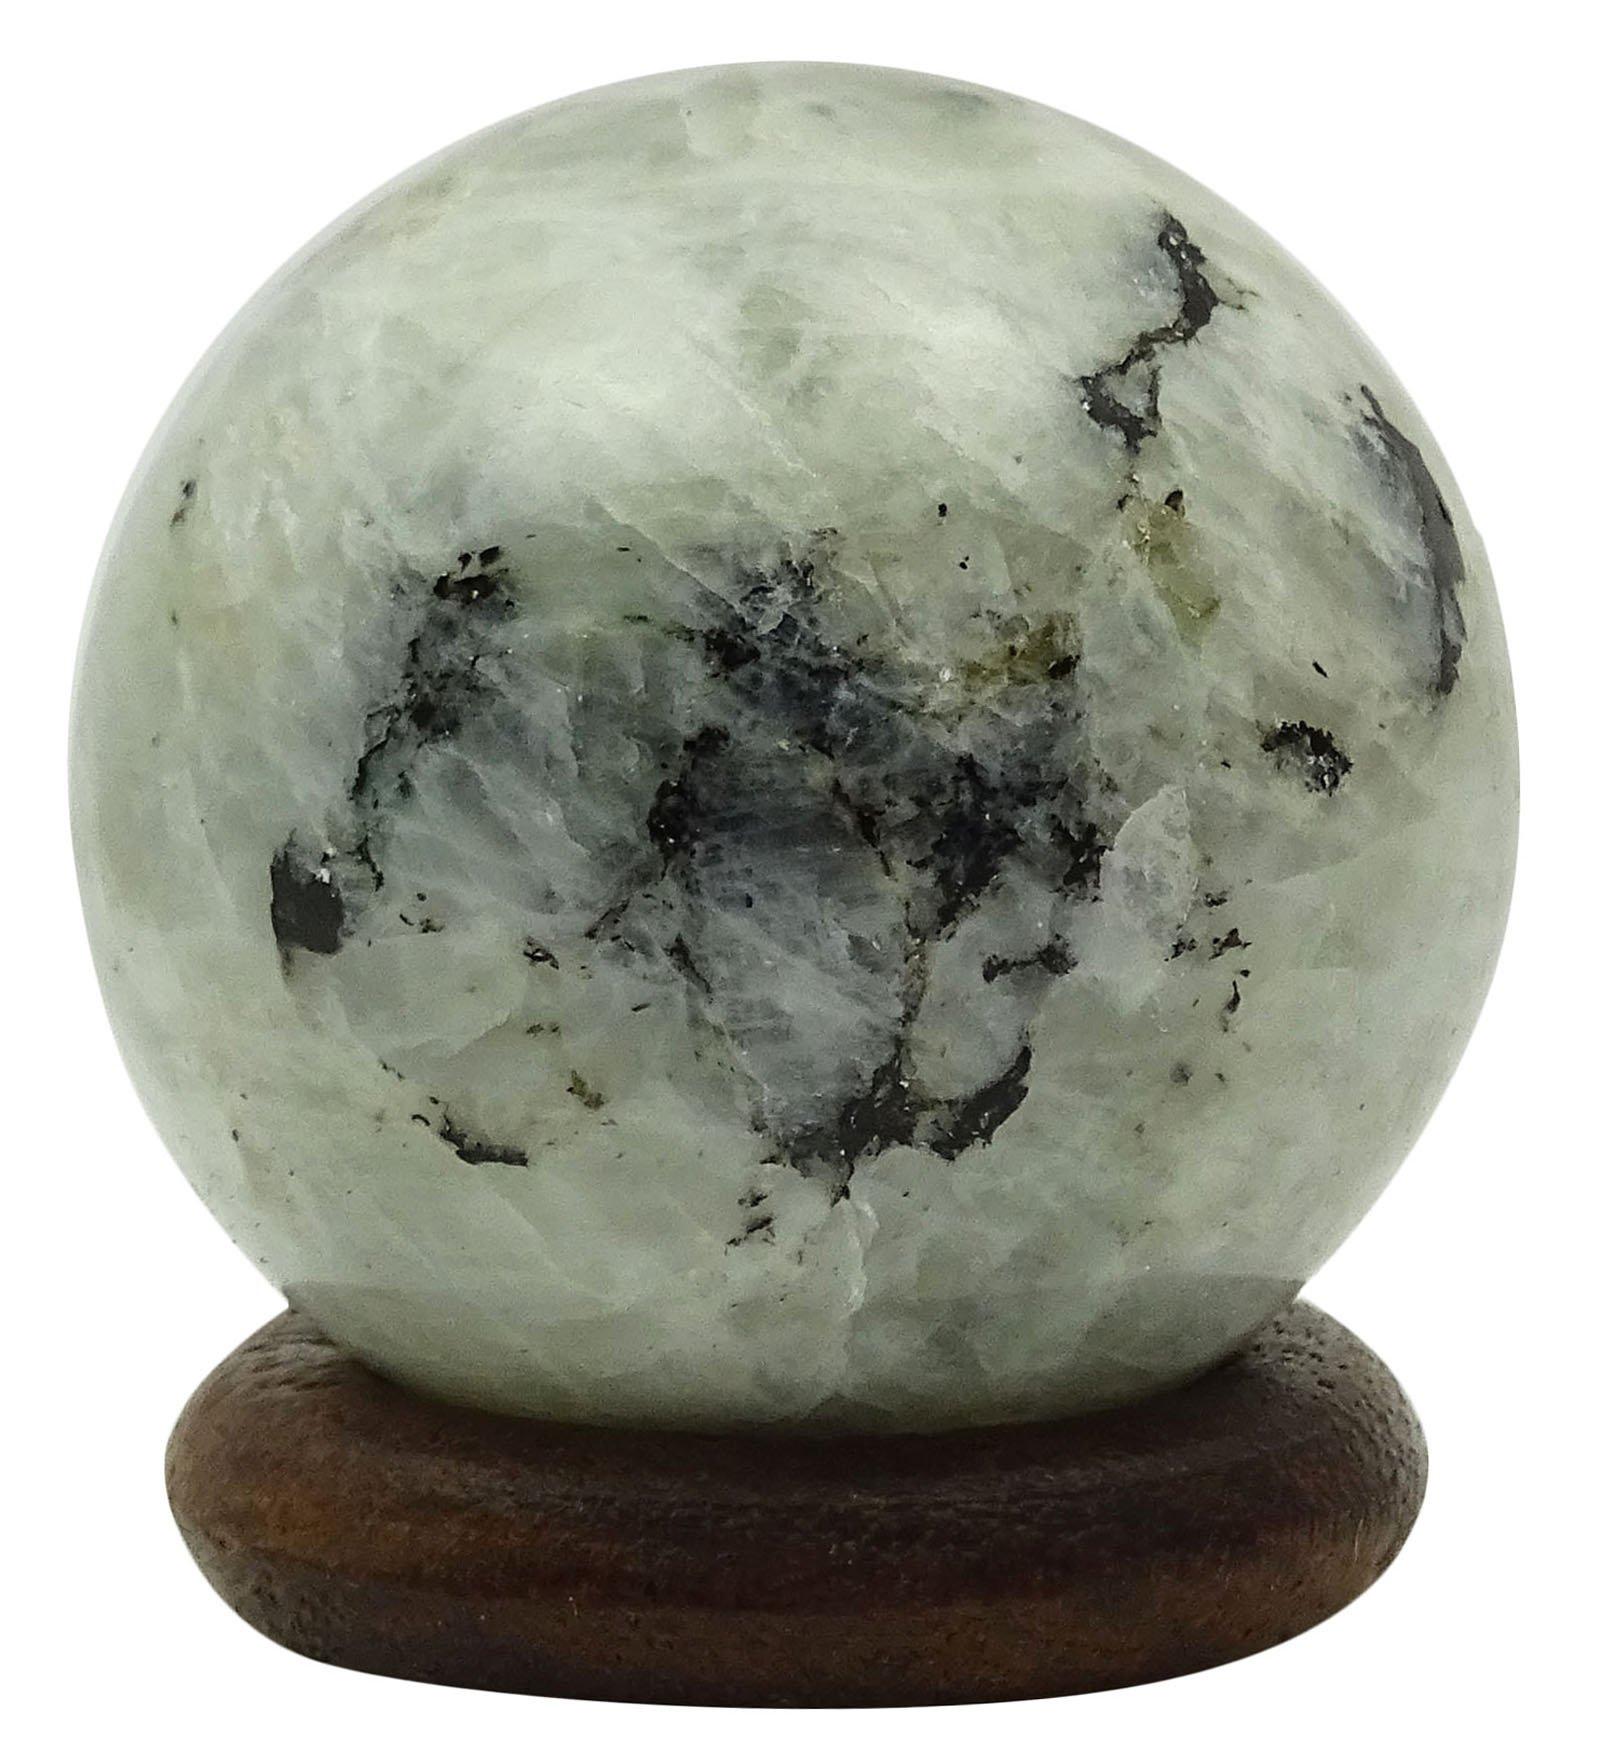 HARMONIZE Rainbow Moonstone Sphere Ball Art Reiki Healing Stone Balancing Table Decor